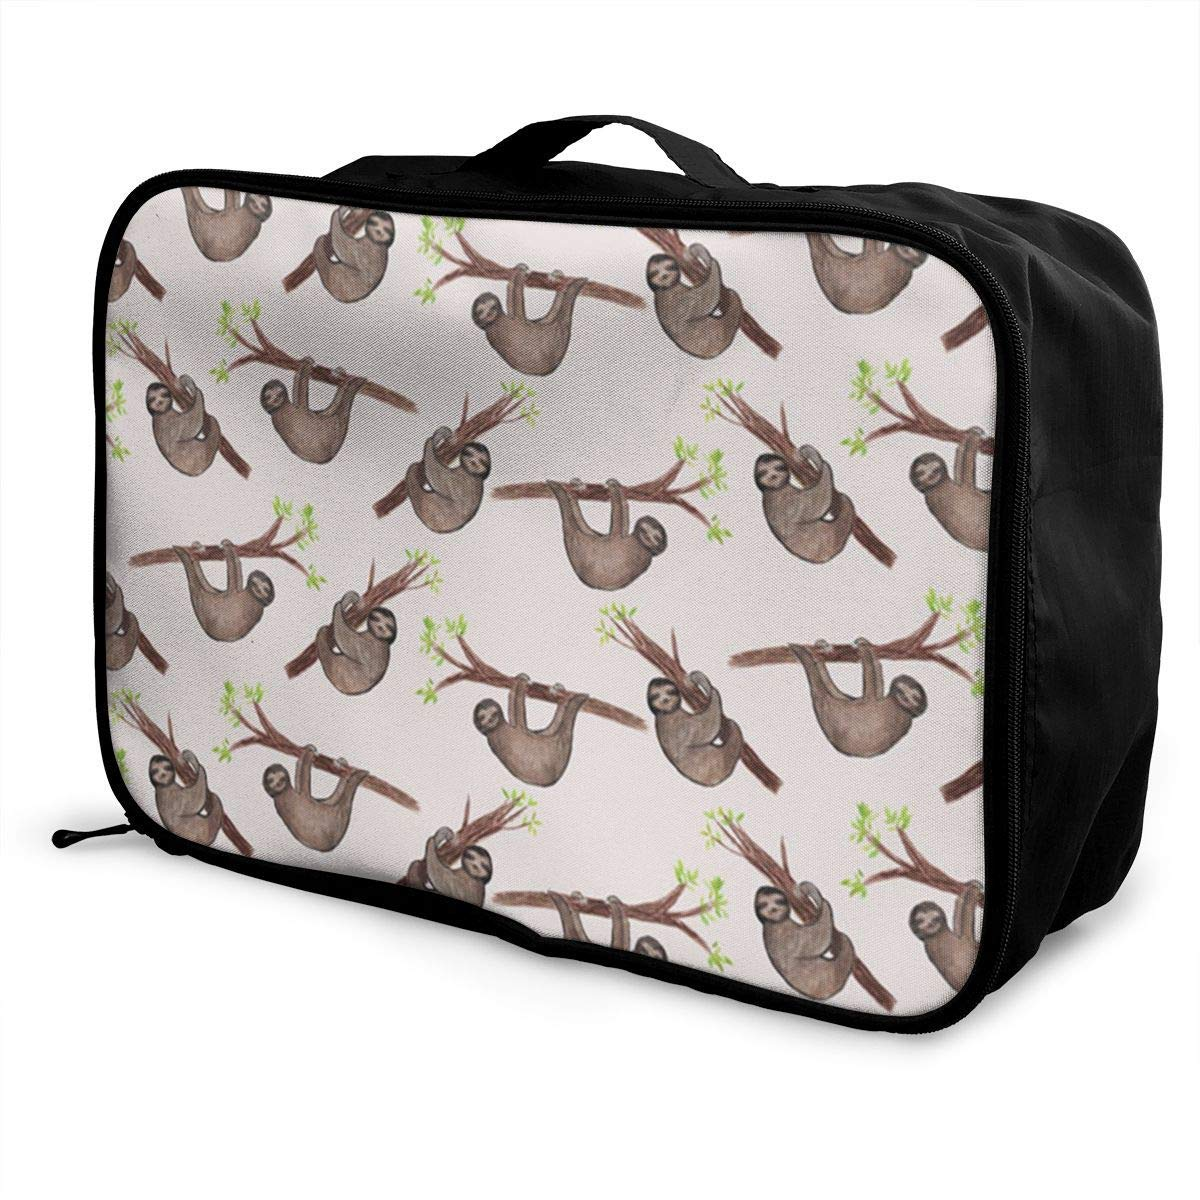 Travel Duffel Bag Waterproof Fashion Lightweight Large Capacity Portable Duffel Bag for Men /& Women JTRVW Luggage Bags for Travel Cute Sloth Pattern